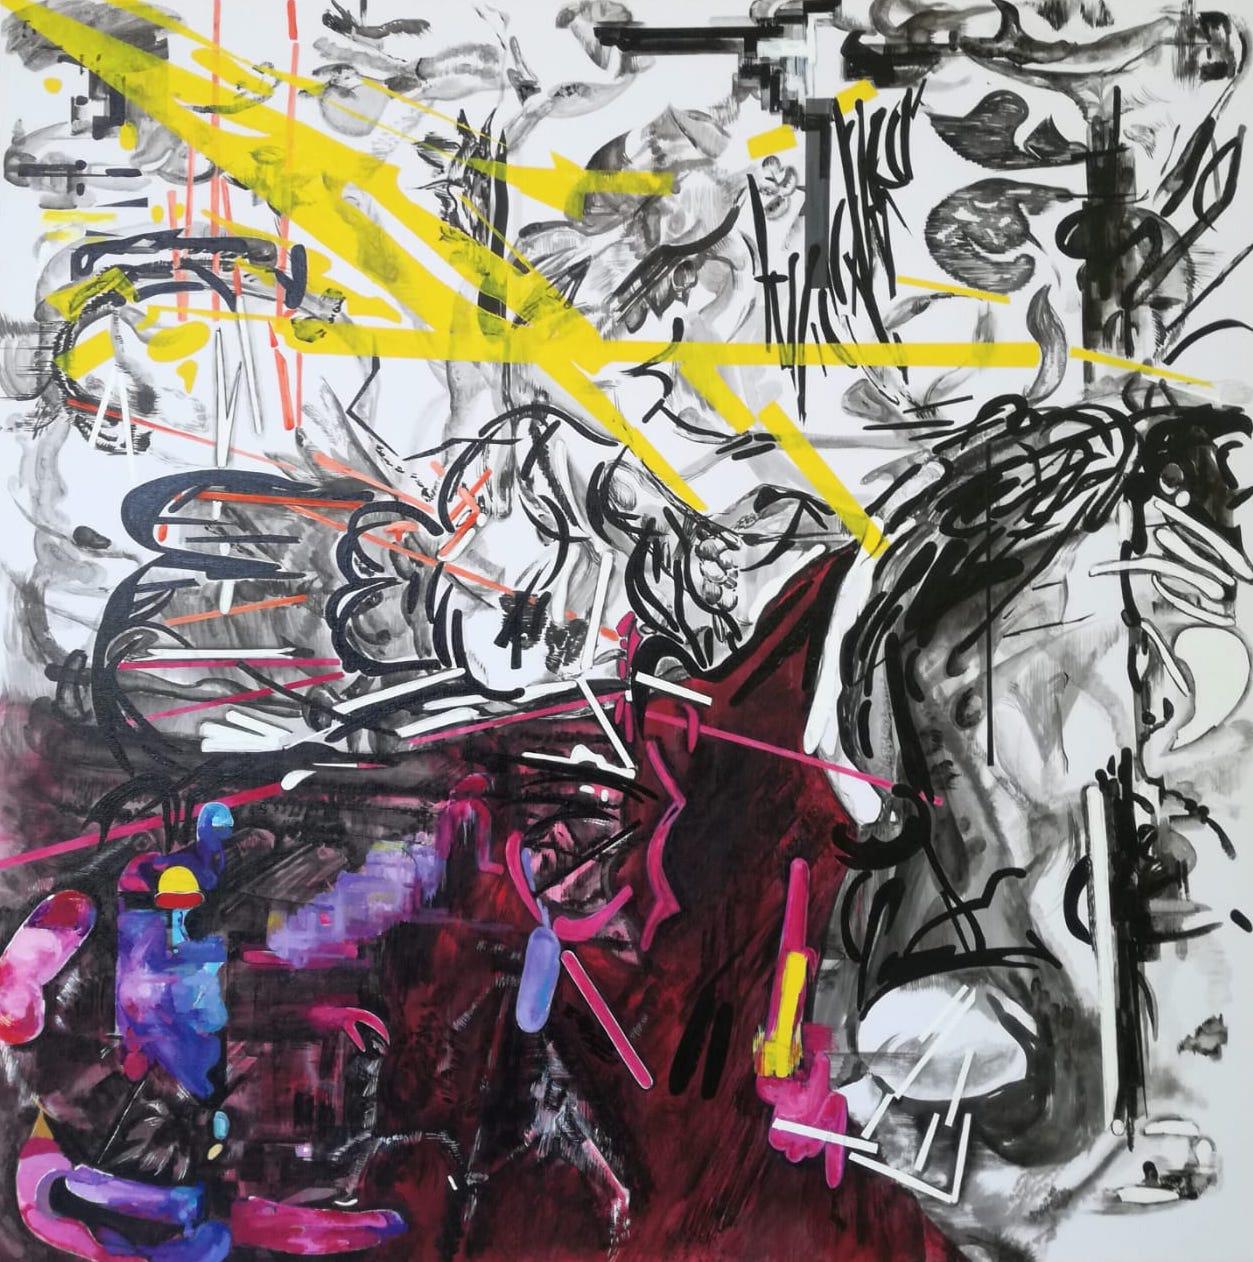 Vana Fertaki Untitled, 2021, acrylics and varnish on canvas, 100 x 100  cm